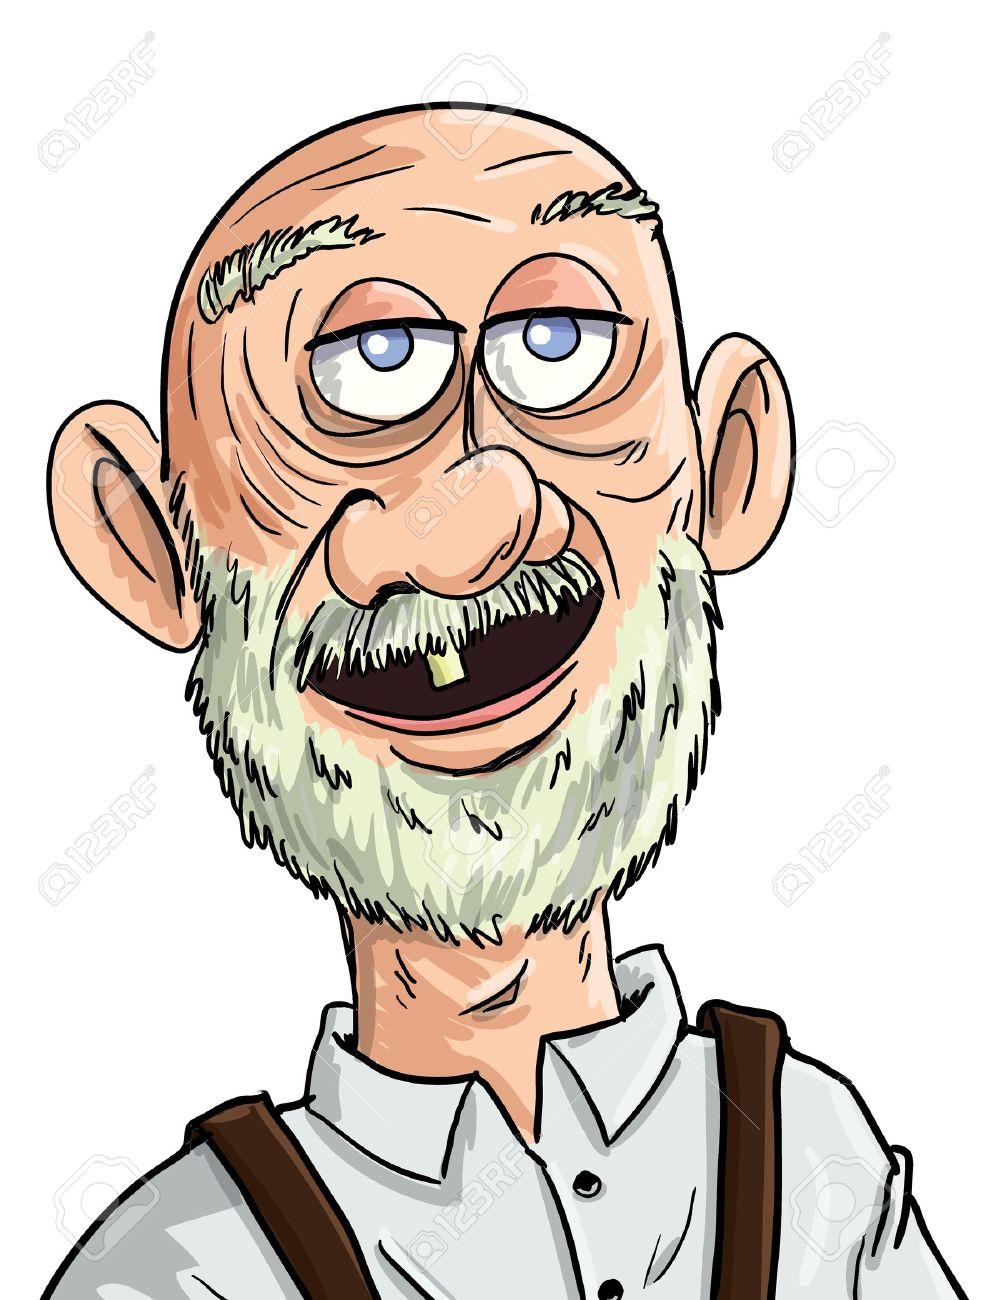 Cartoon Old Man png images | PNGEgg